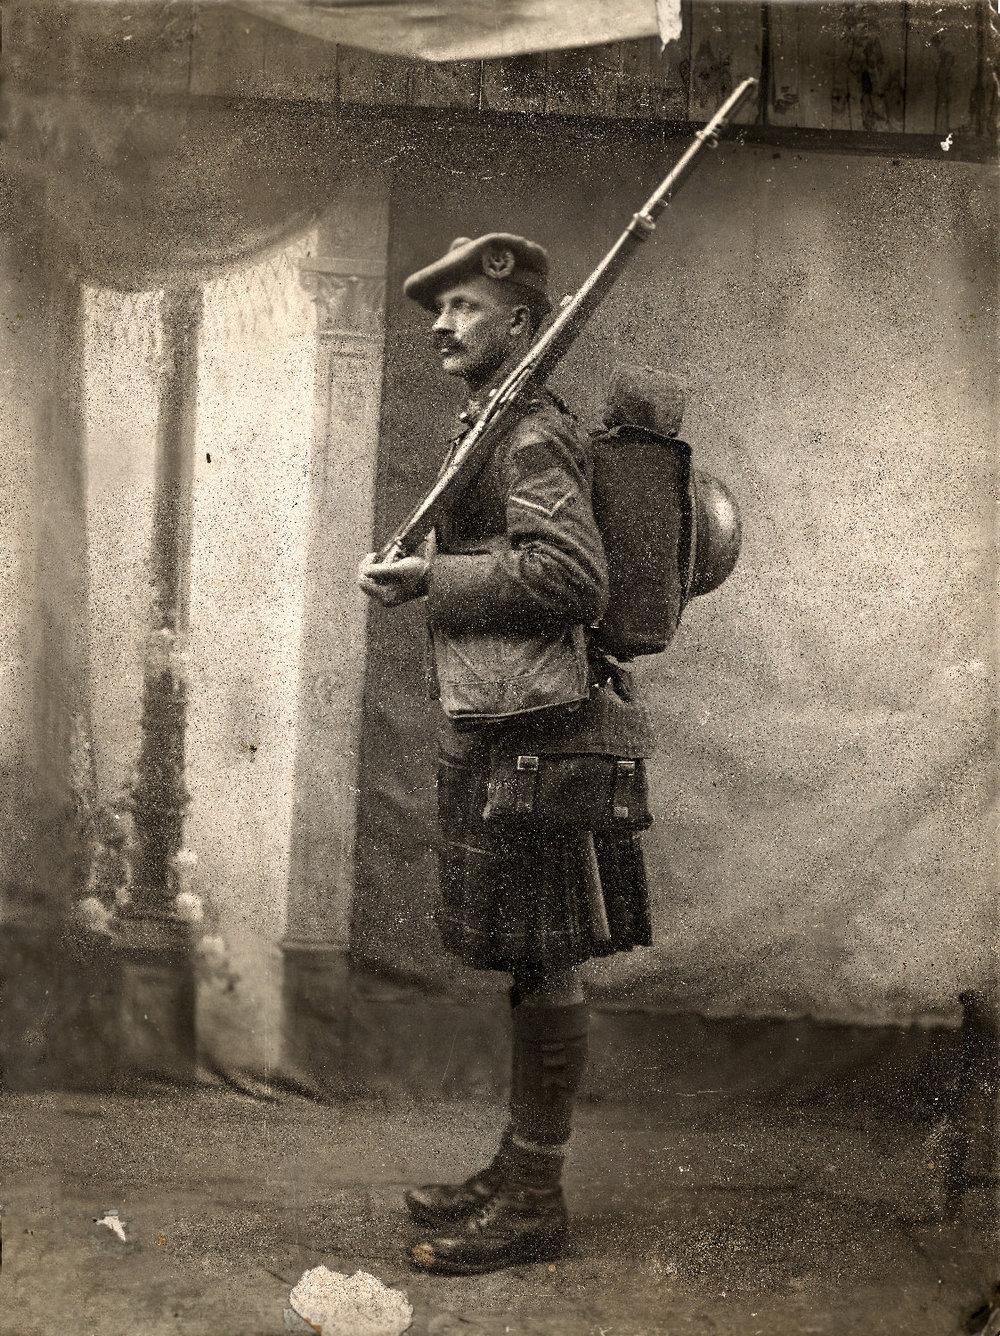 Lance Corporal James Rae, 72nd Battalion, Seaforth Highlanders of Canada